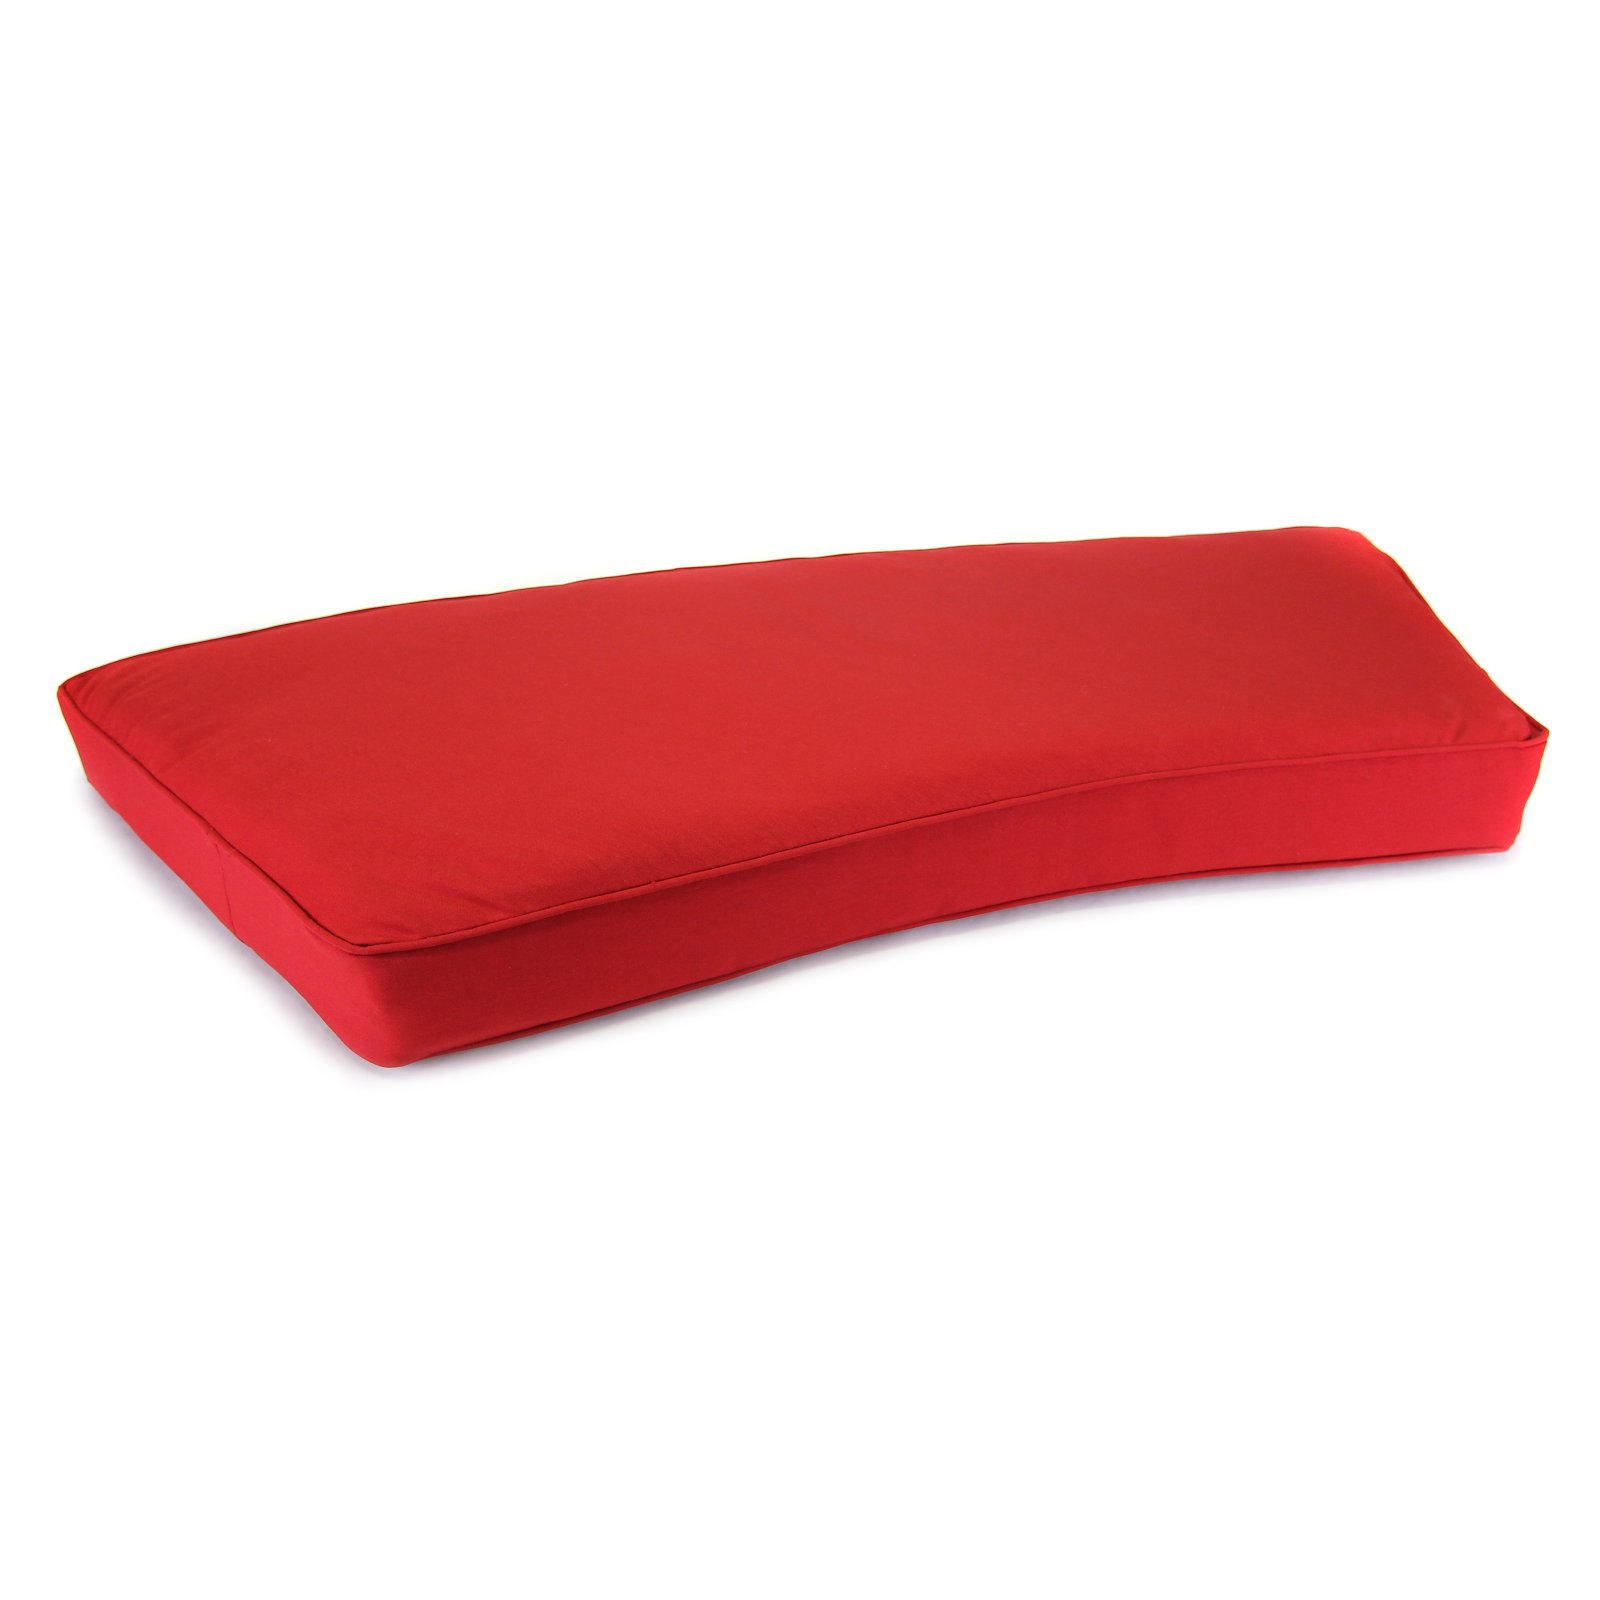 Belham Living Rendezvous Sunbrella Day Bed Full Cushion Replacement Set by Jordan Manufacturing